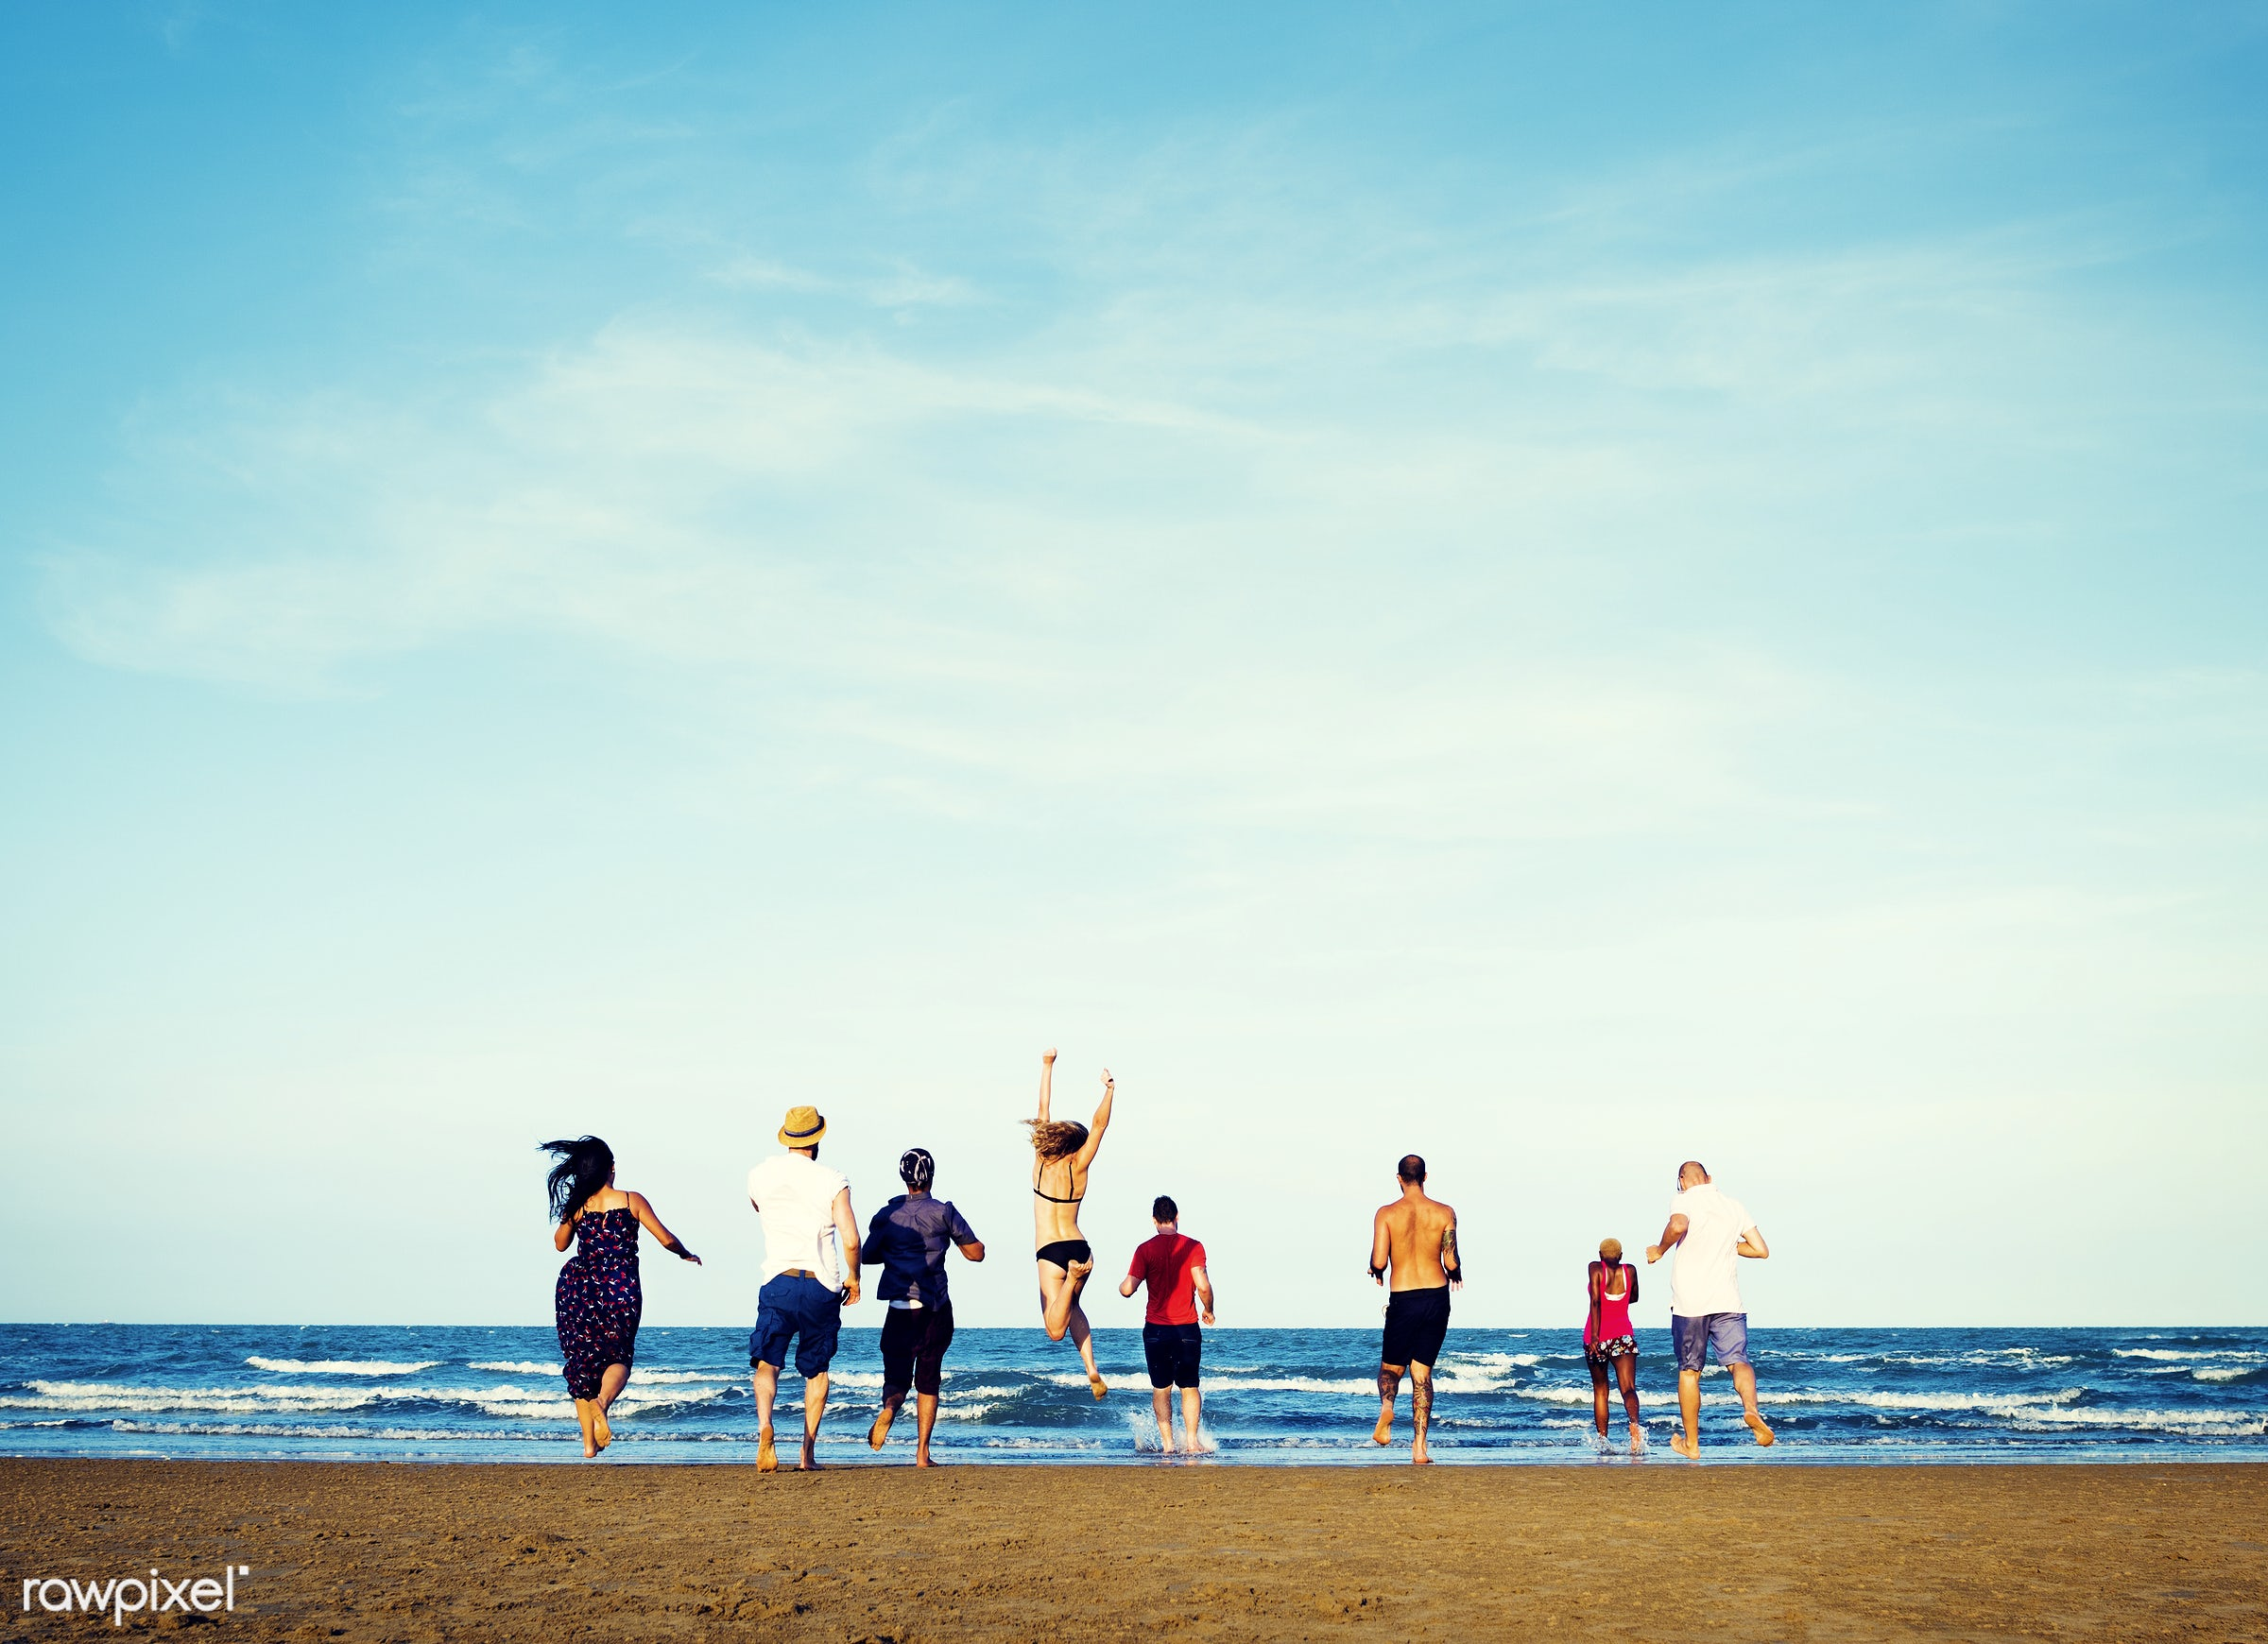 Friends having fun at the beach - rear view, beach, beautiful, bikini, bonding, bright, carefree, chilling, colorful,...